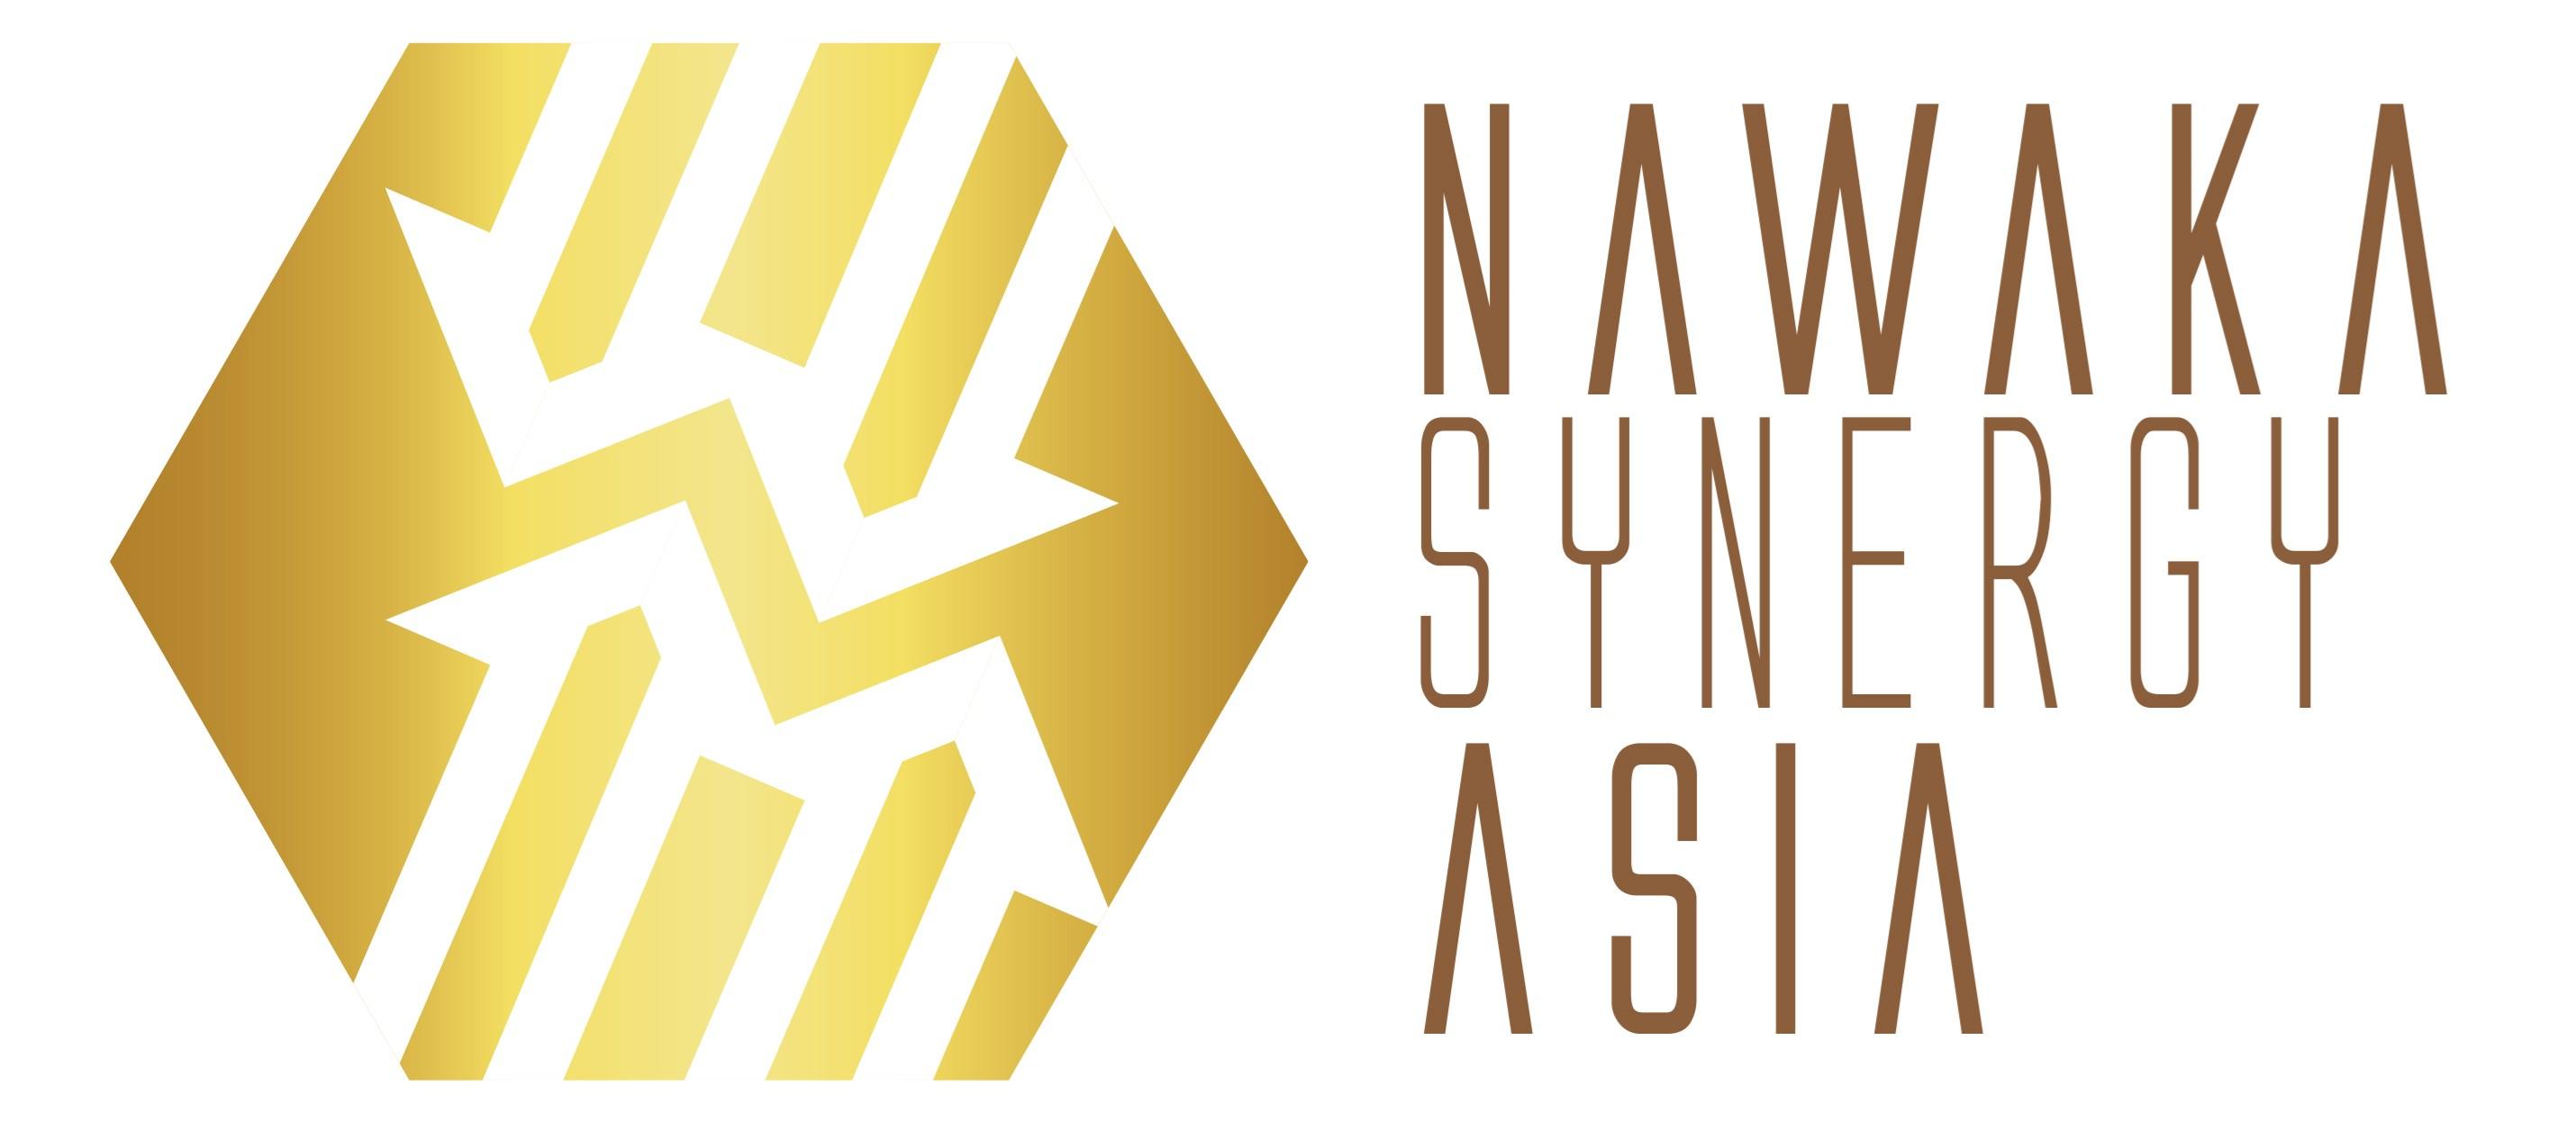 PT. Nawaka Synergy Asia